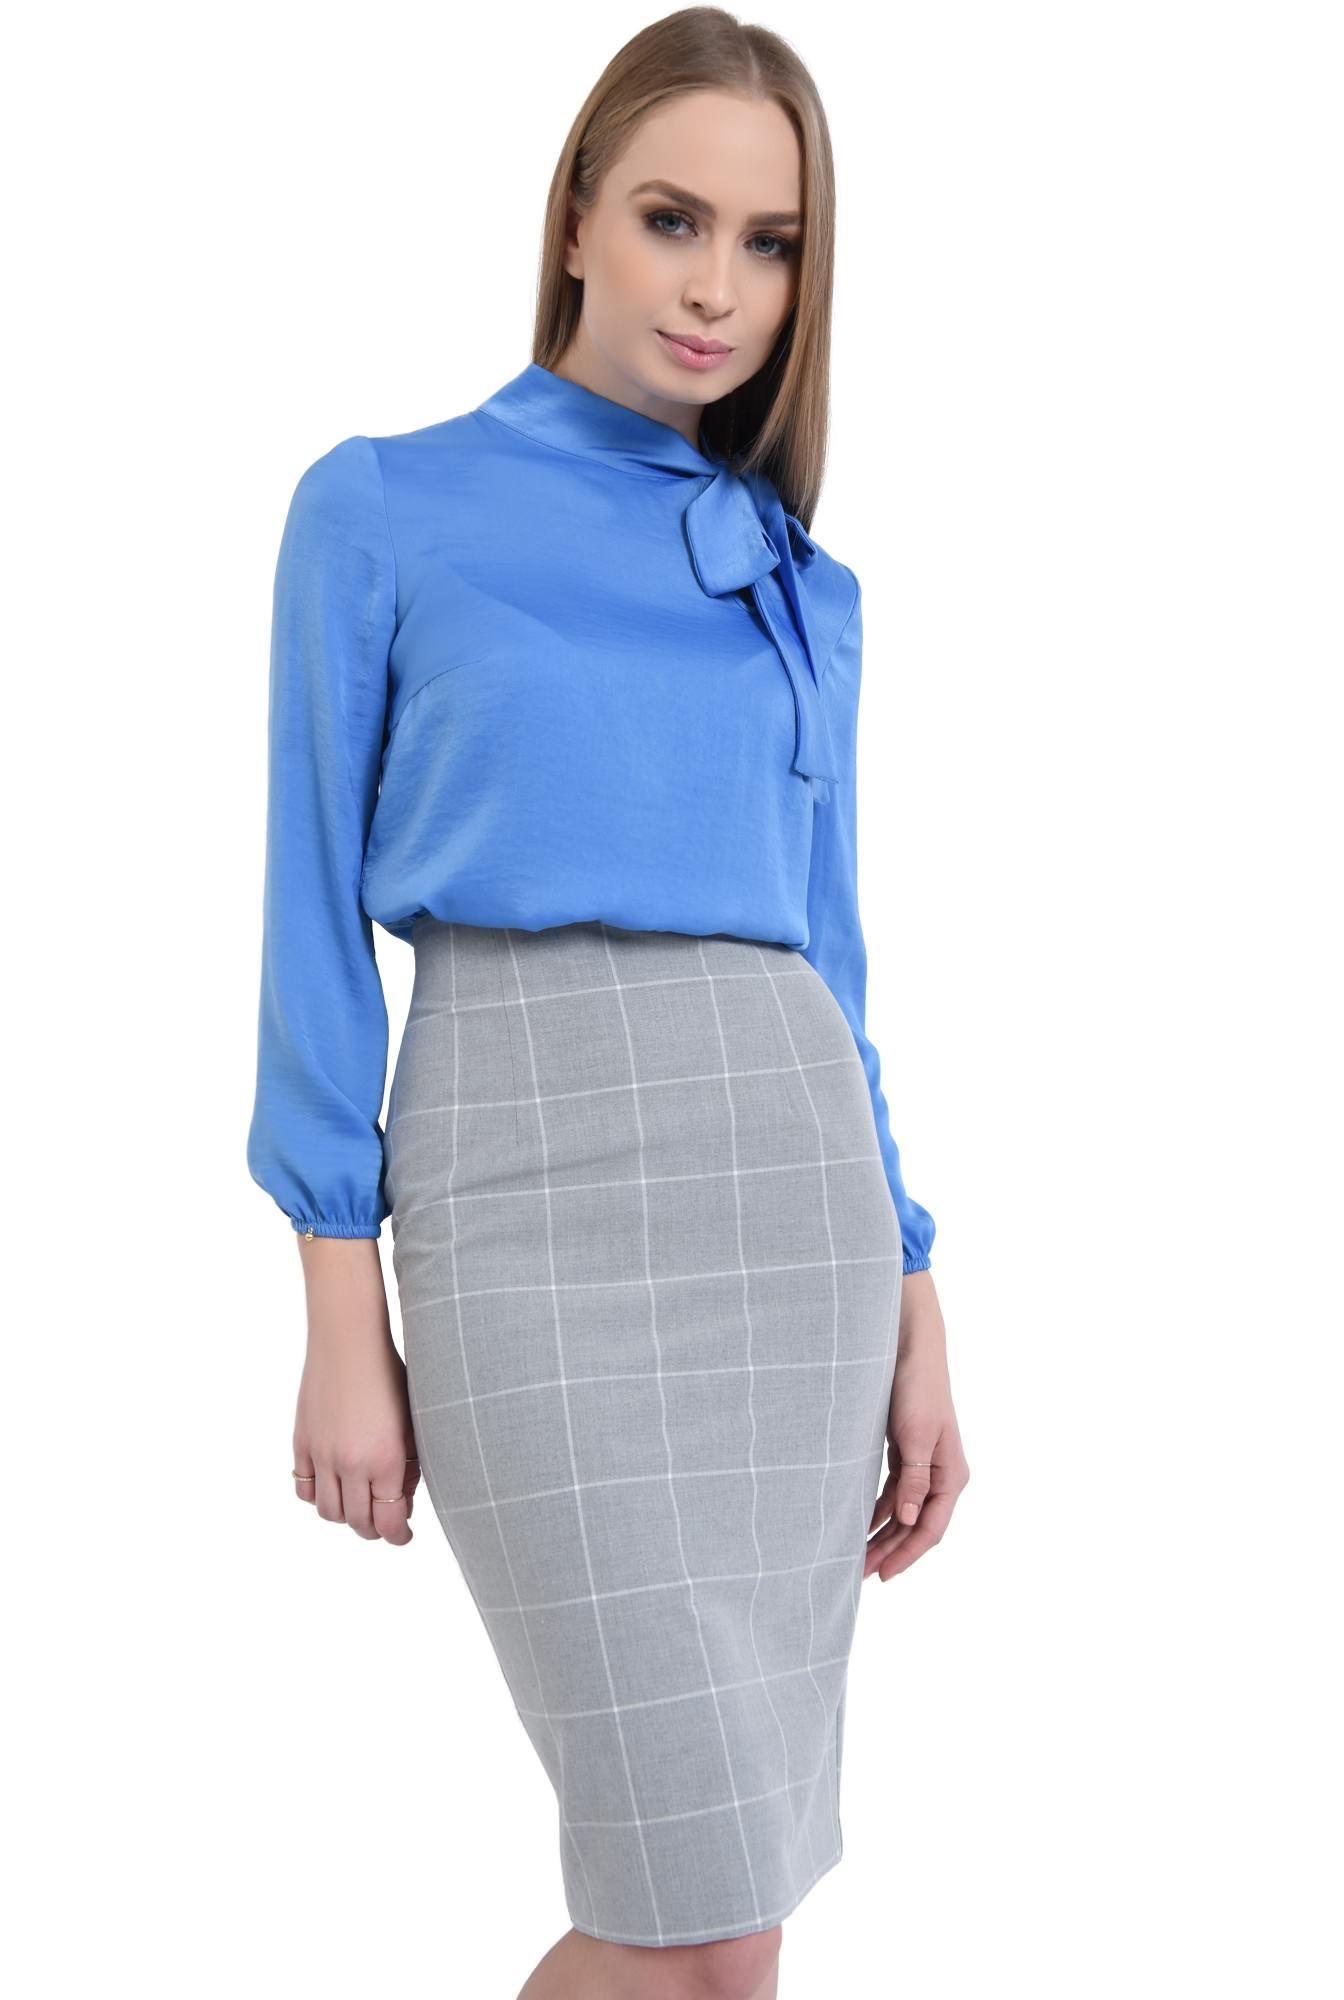 0 - bluza office, bleu, satinata, maneci lungi